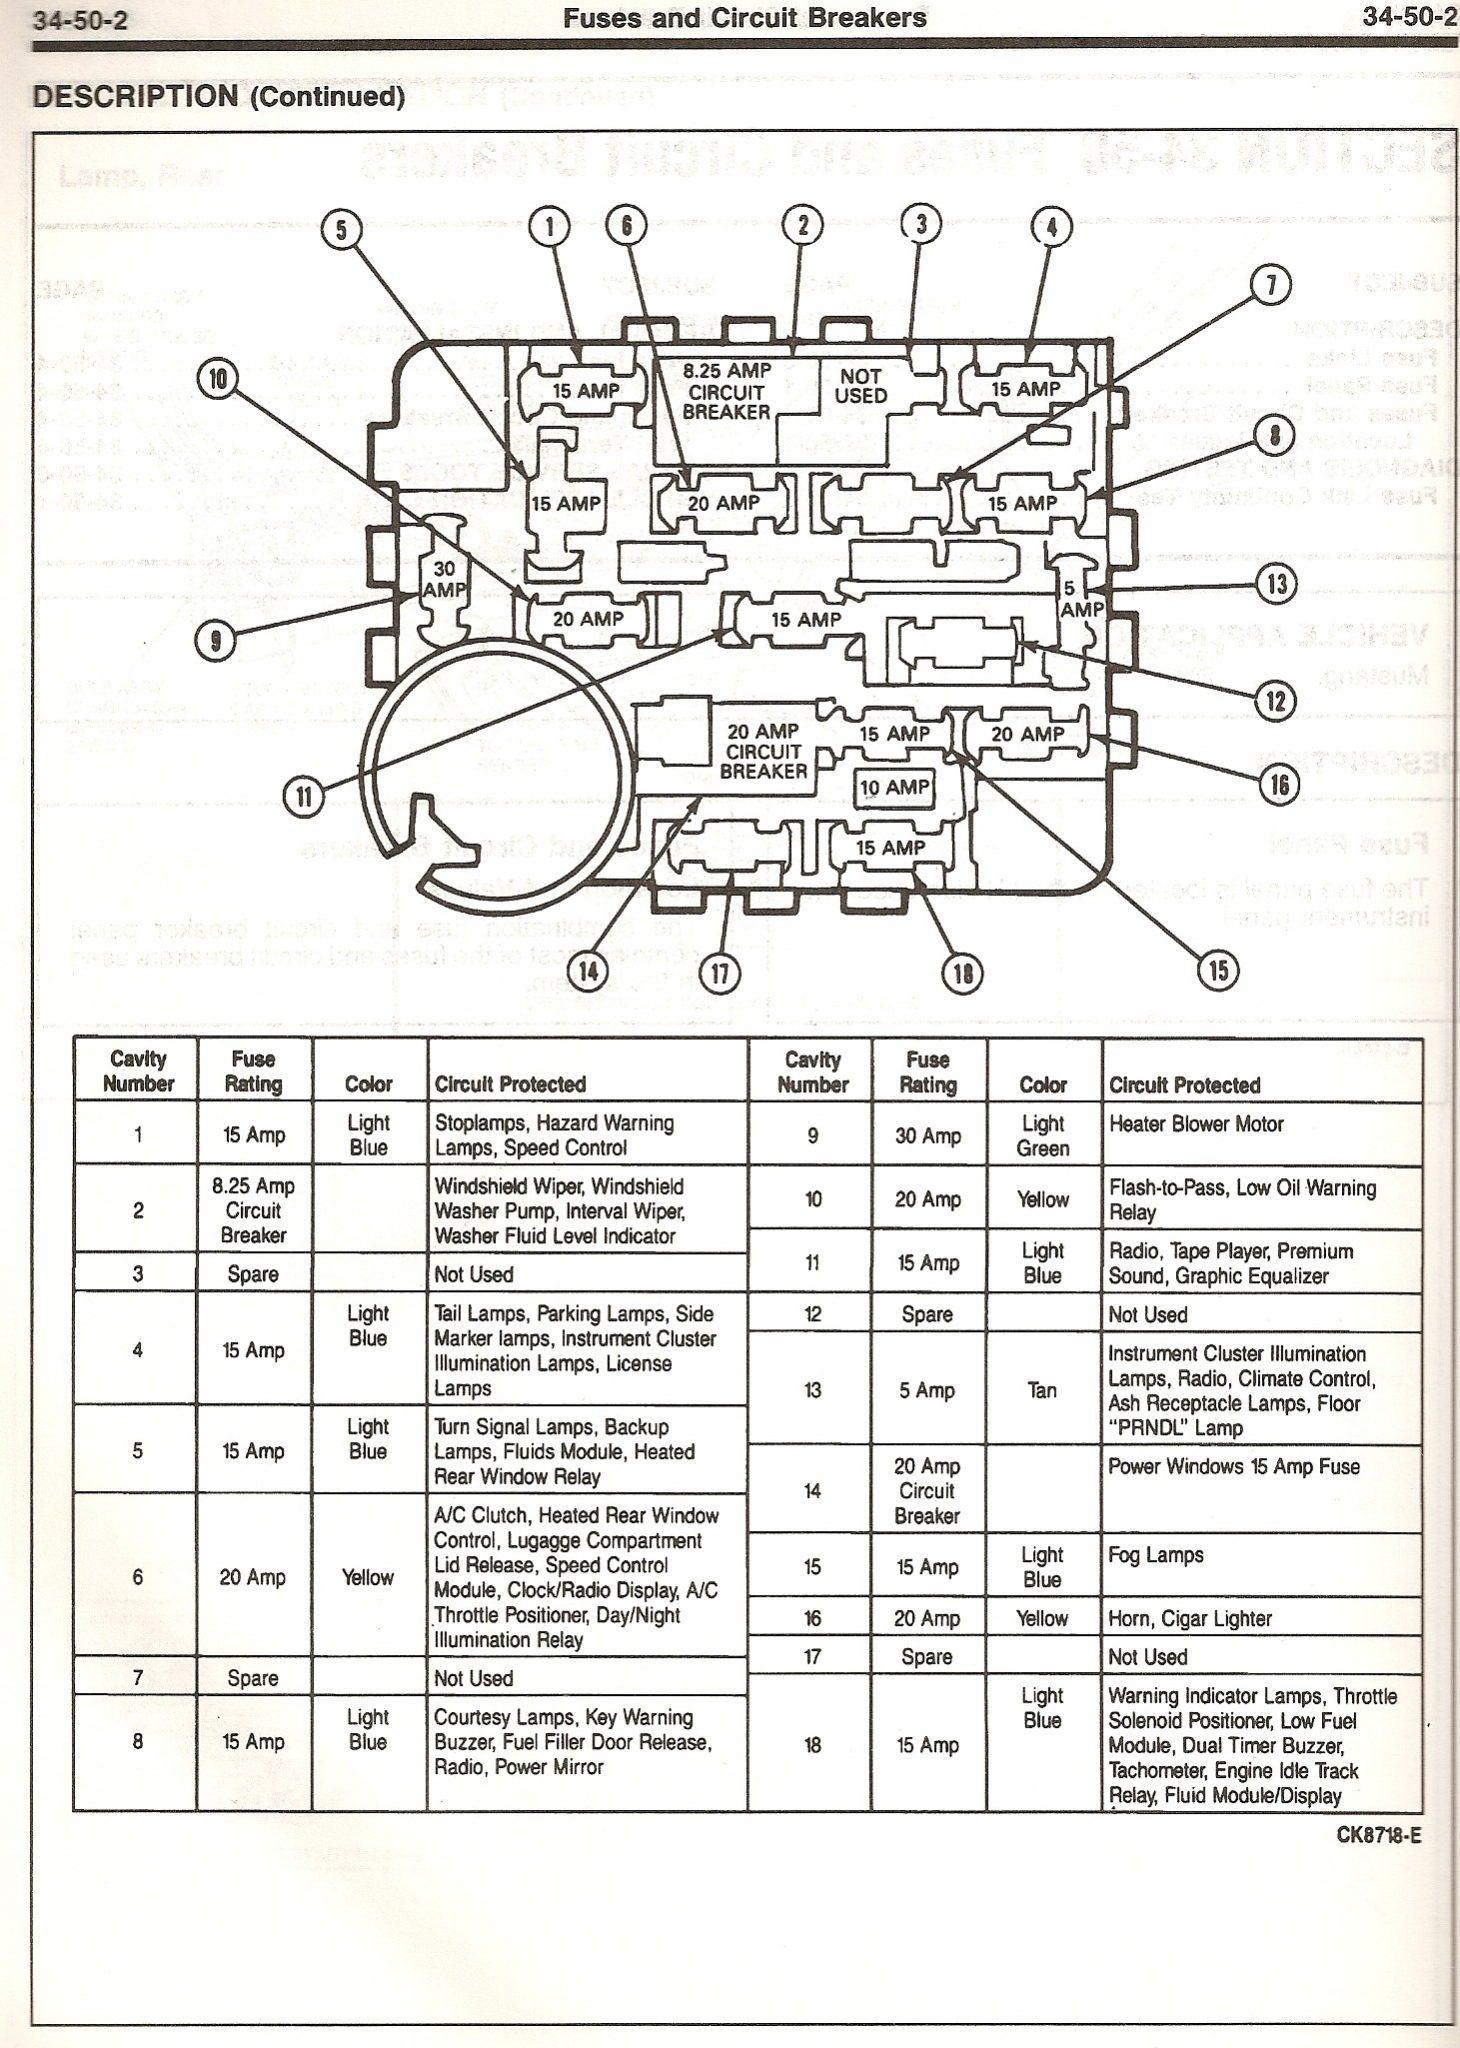 1987 Ford Mustang Fuse Box Diagram Trusted Wiring 1985 Wire Data Schema U2022 Porsche 944